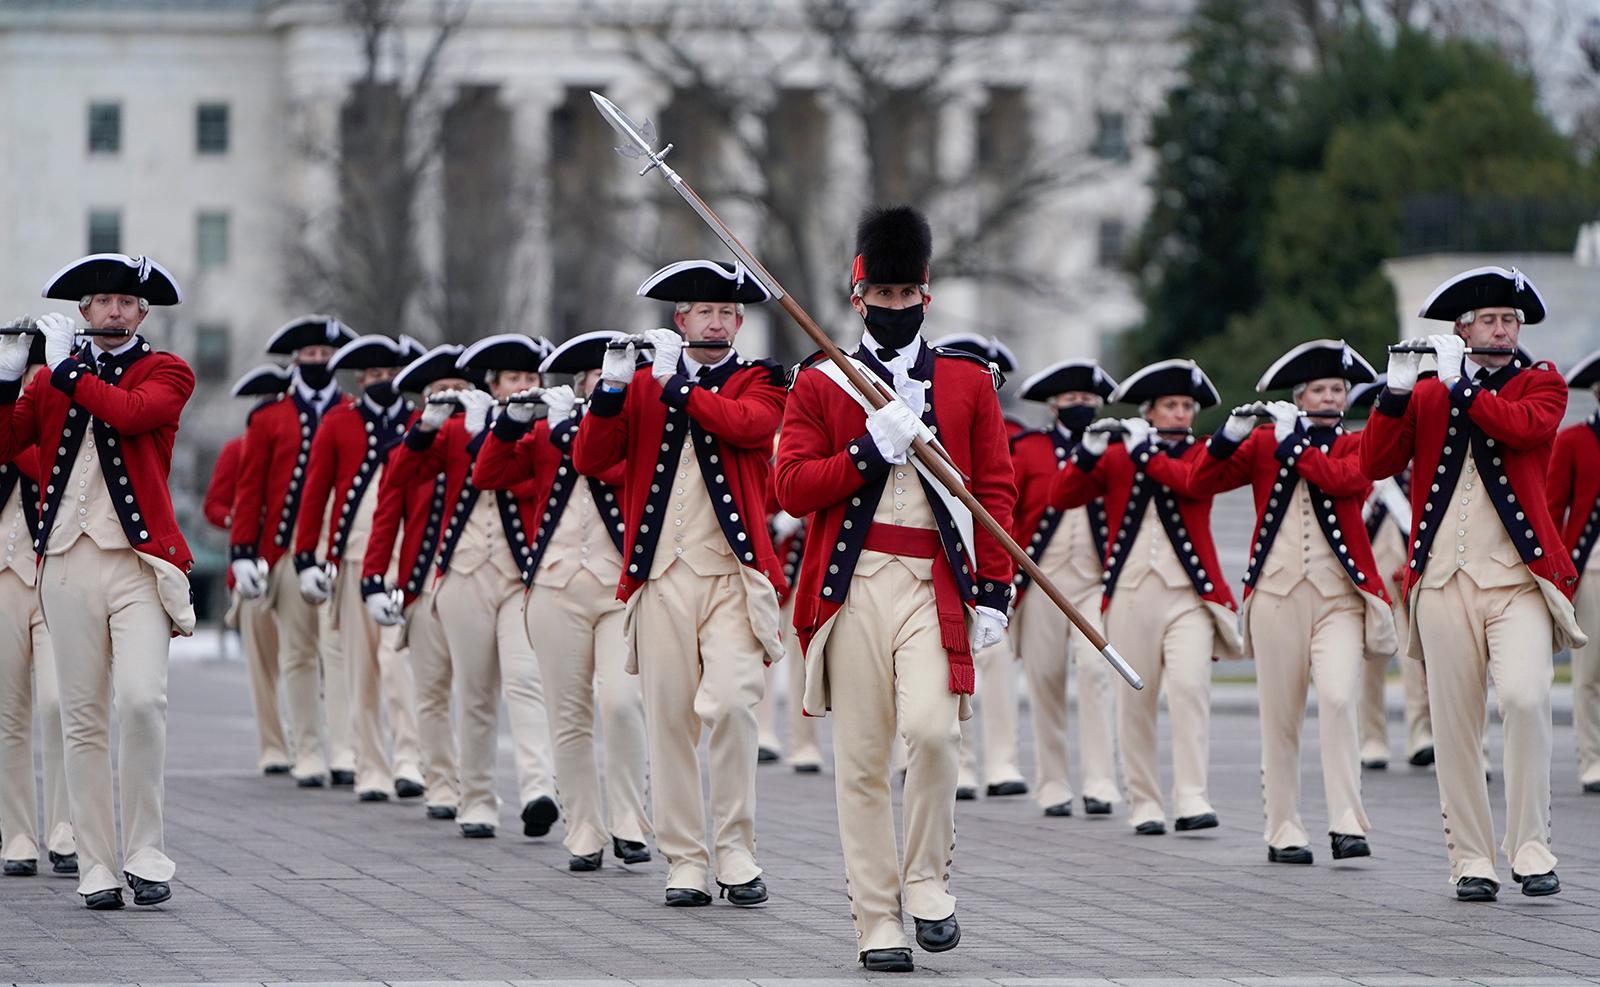 Military Band members dressed in 18th century costumes rehearse near the U.S. Capitol Hill, ahead of U.S. President-elect Joe Biden's inauguration, in Washington, U.S., January 18, 2021. Reuters